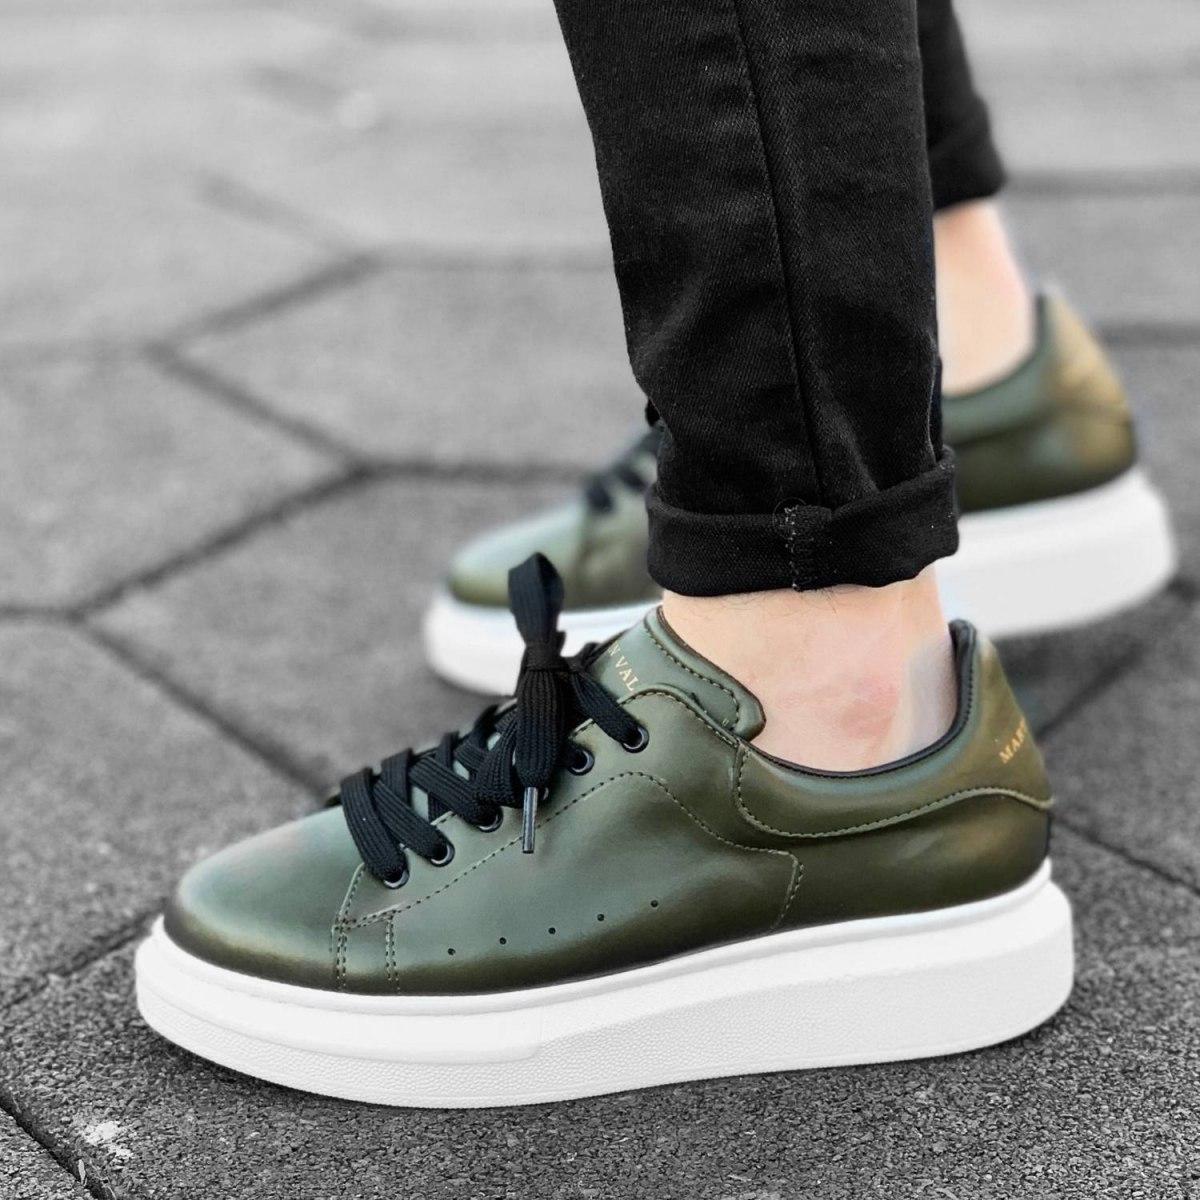 Hype Sole Sneakers in Khaki-White